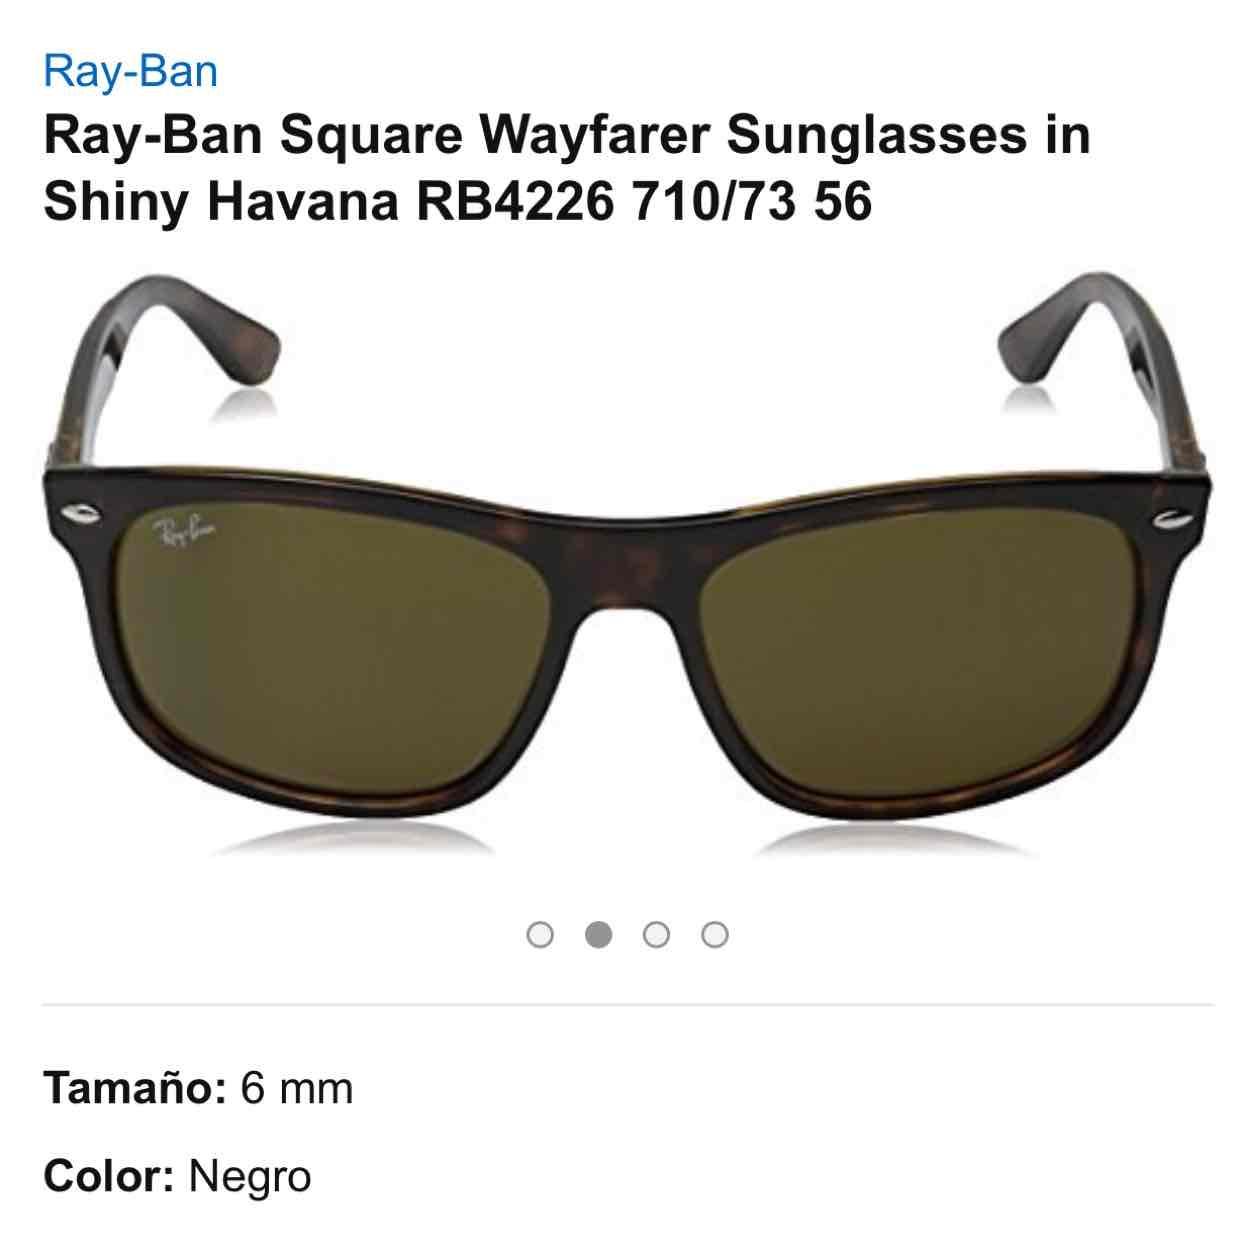 Amazon MX: lentes Ray-Ban Wayfarer a $1,799